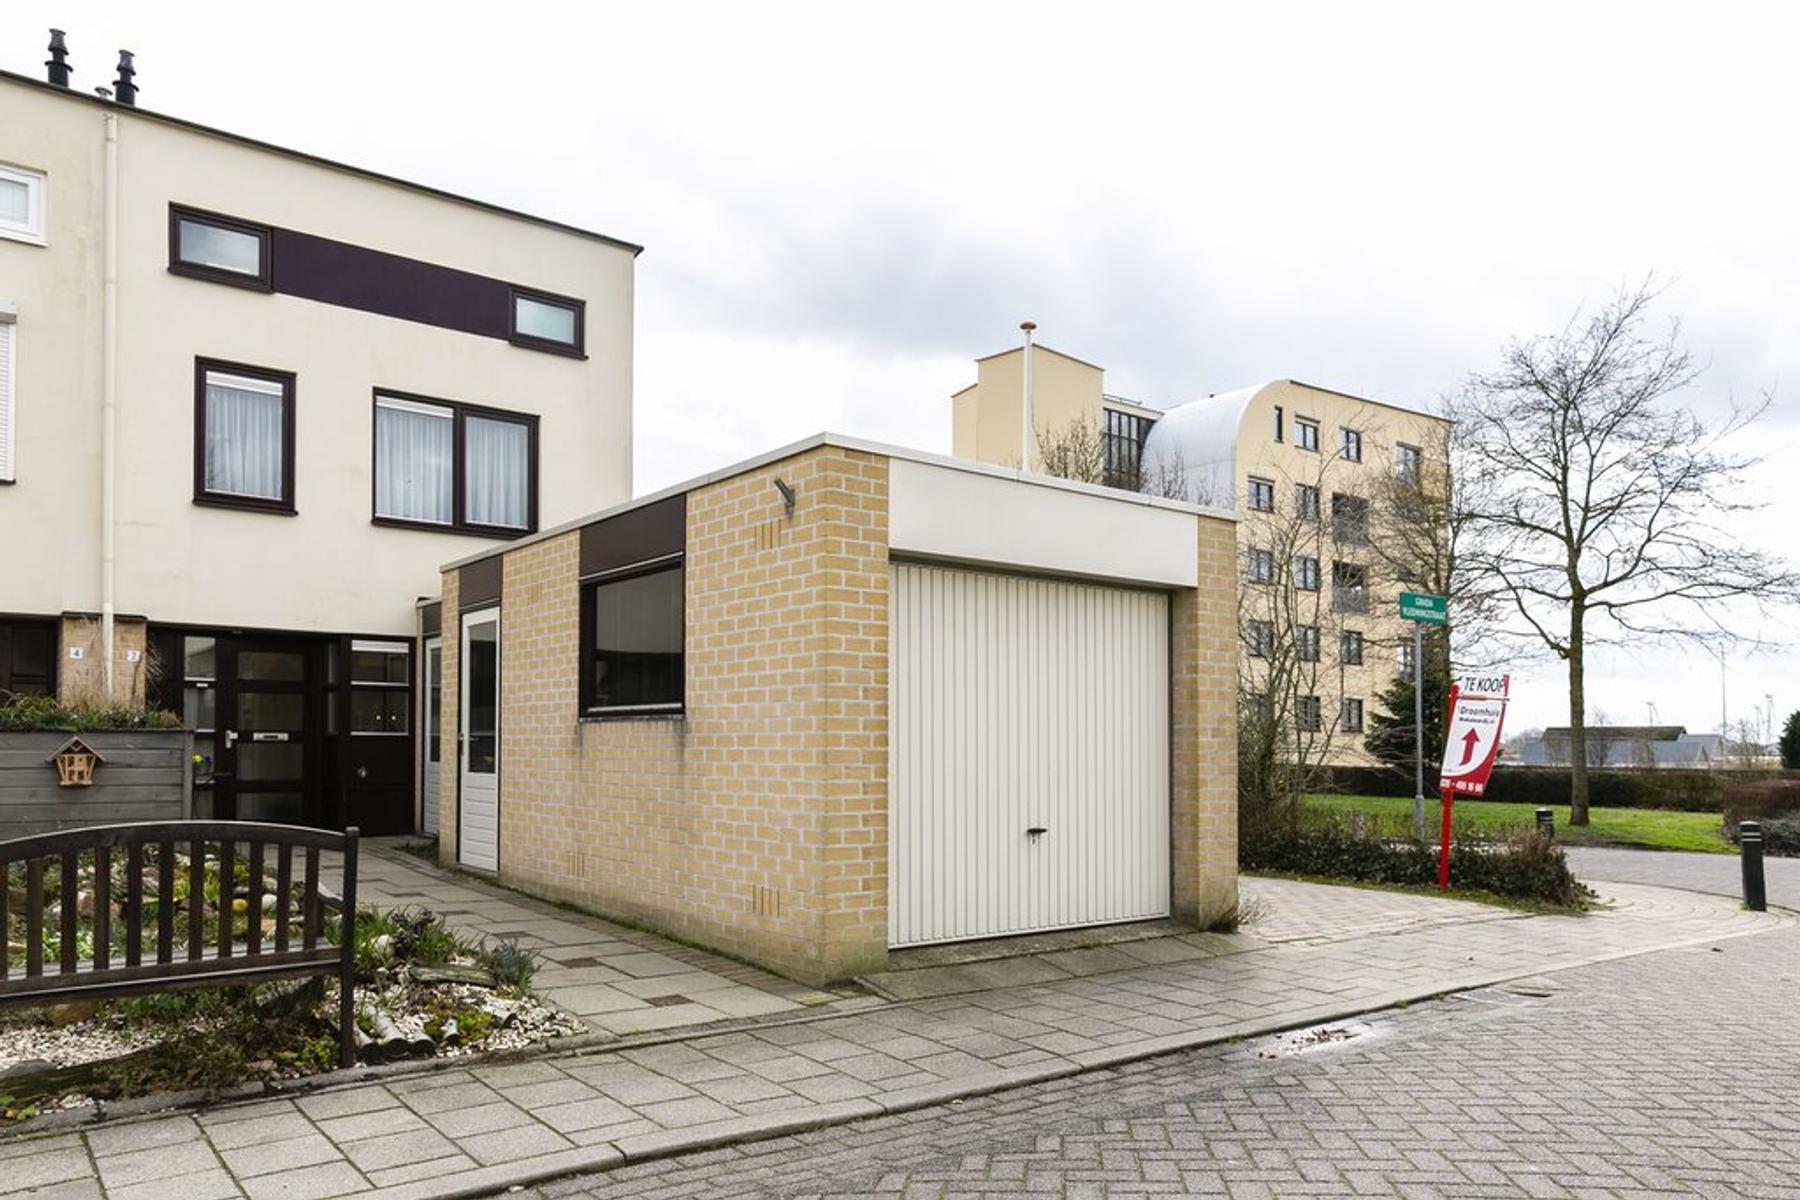 Grada Vleemingstraat 2 in Rheden 6991 ZB